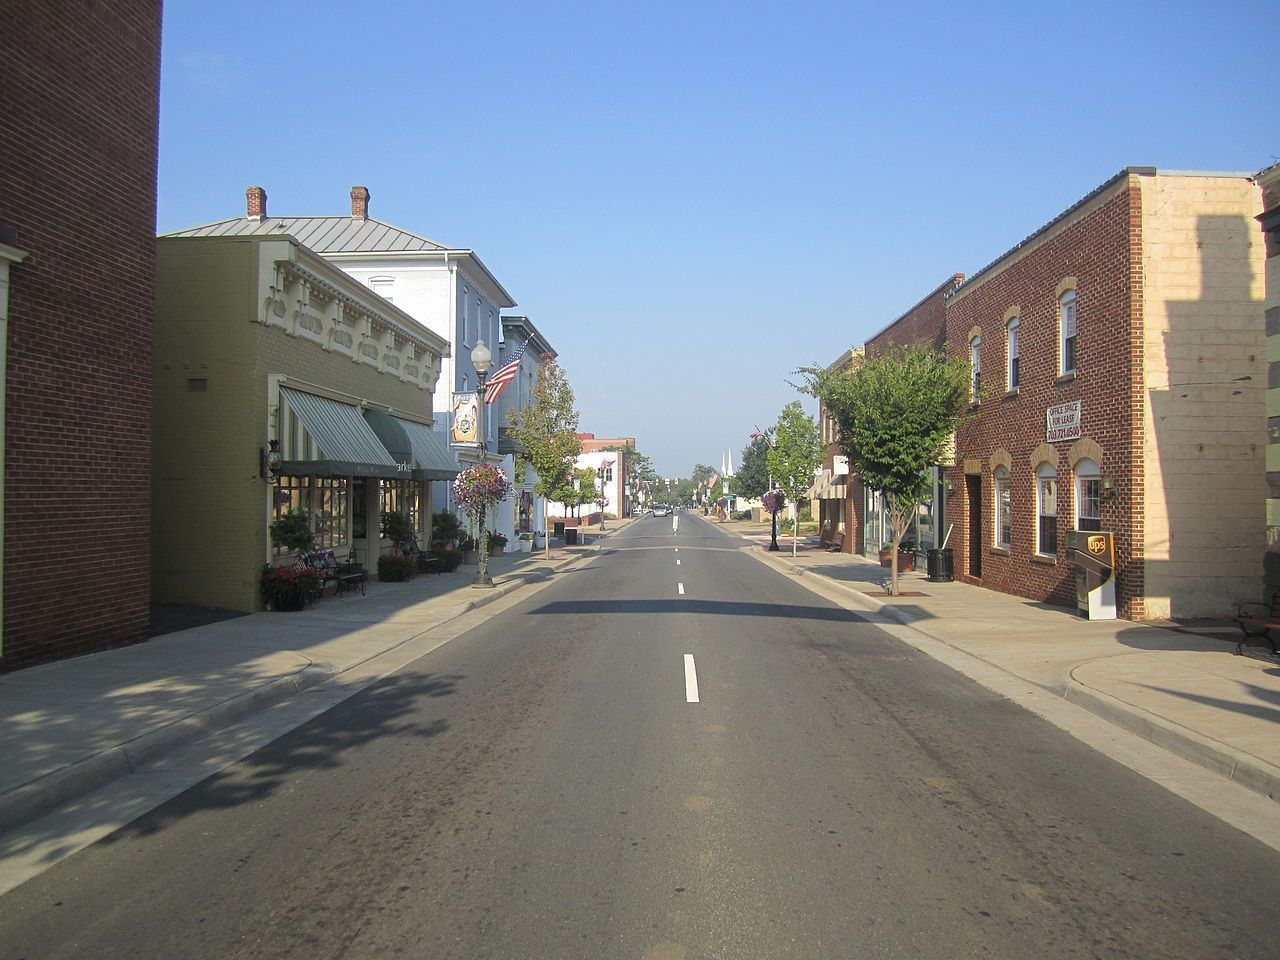 Downtown Manassas